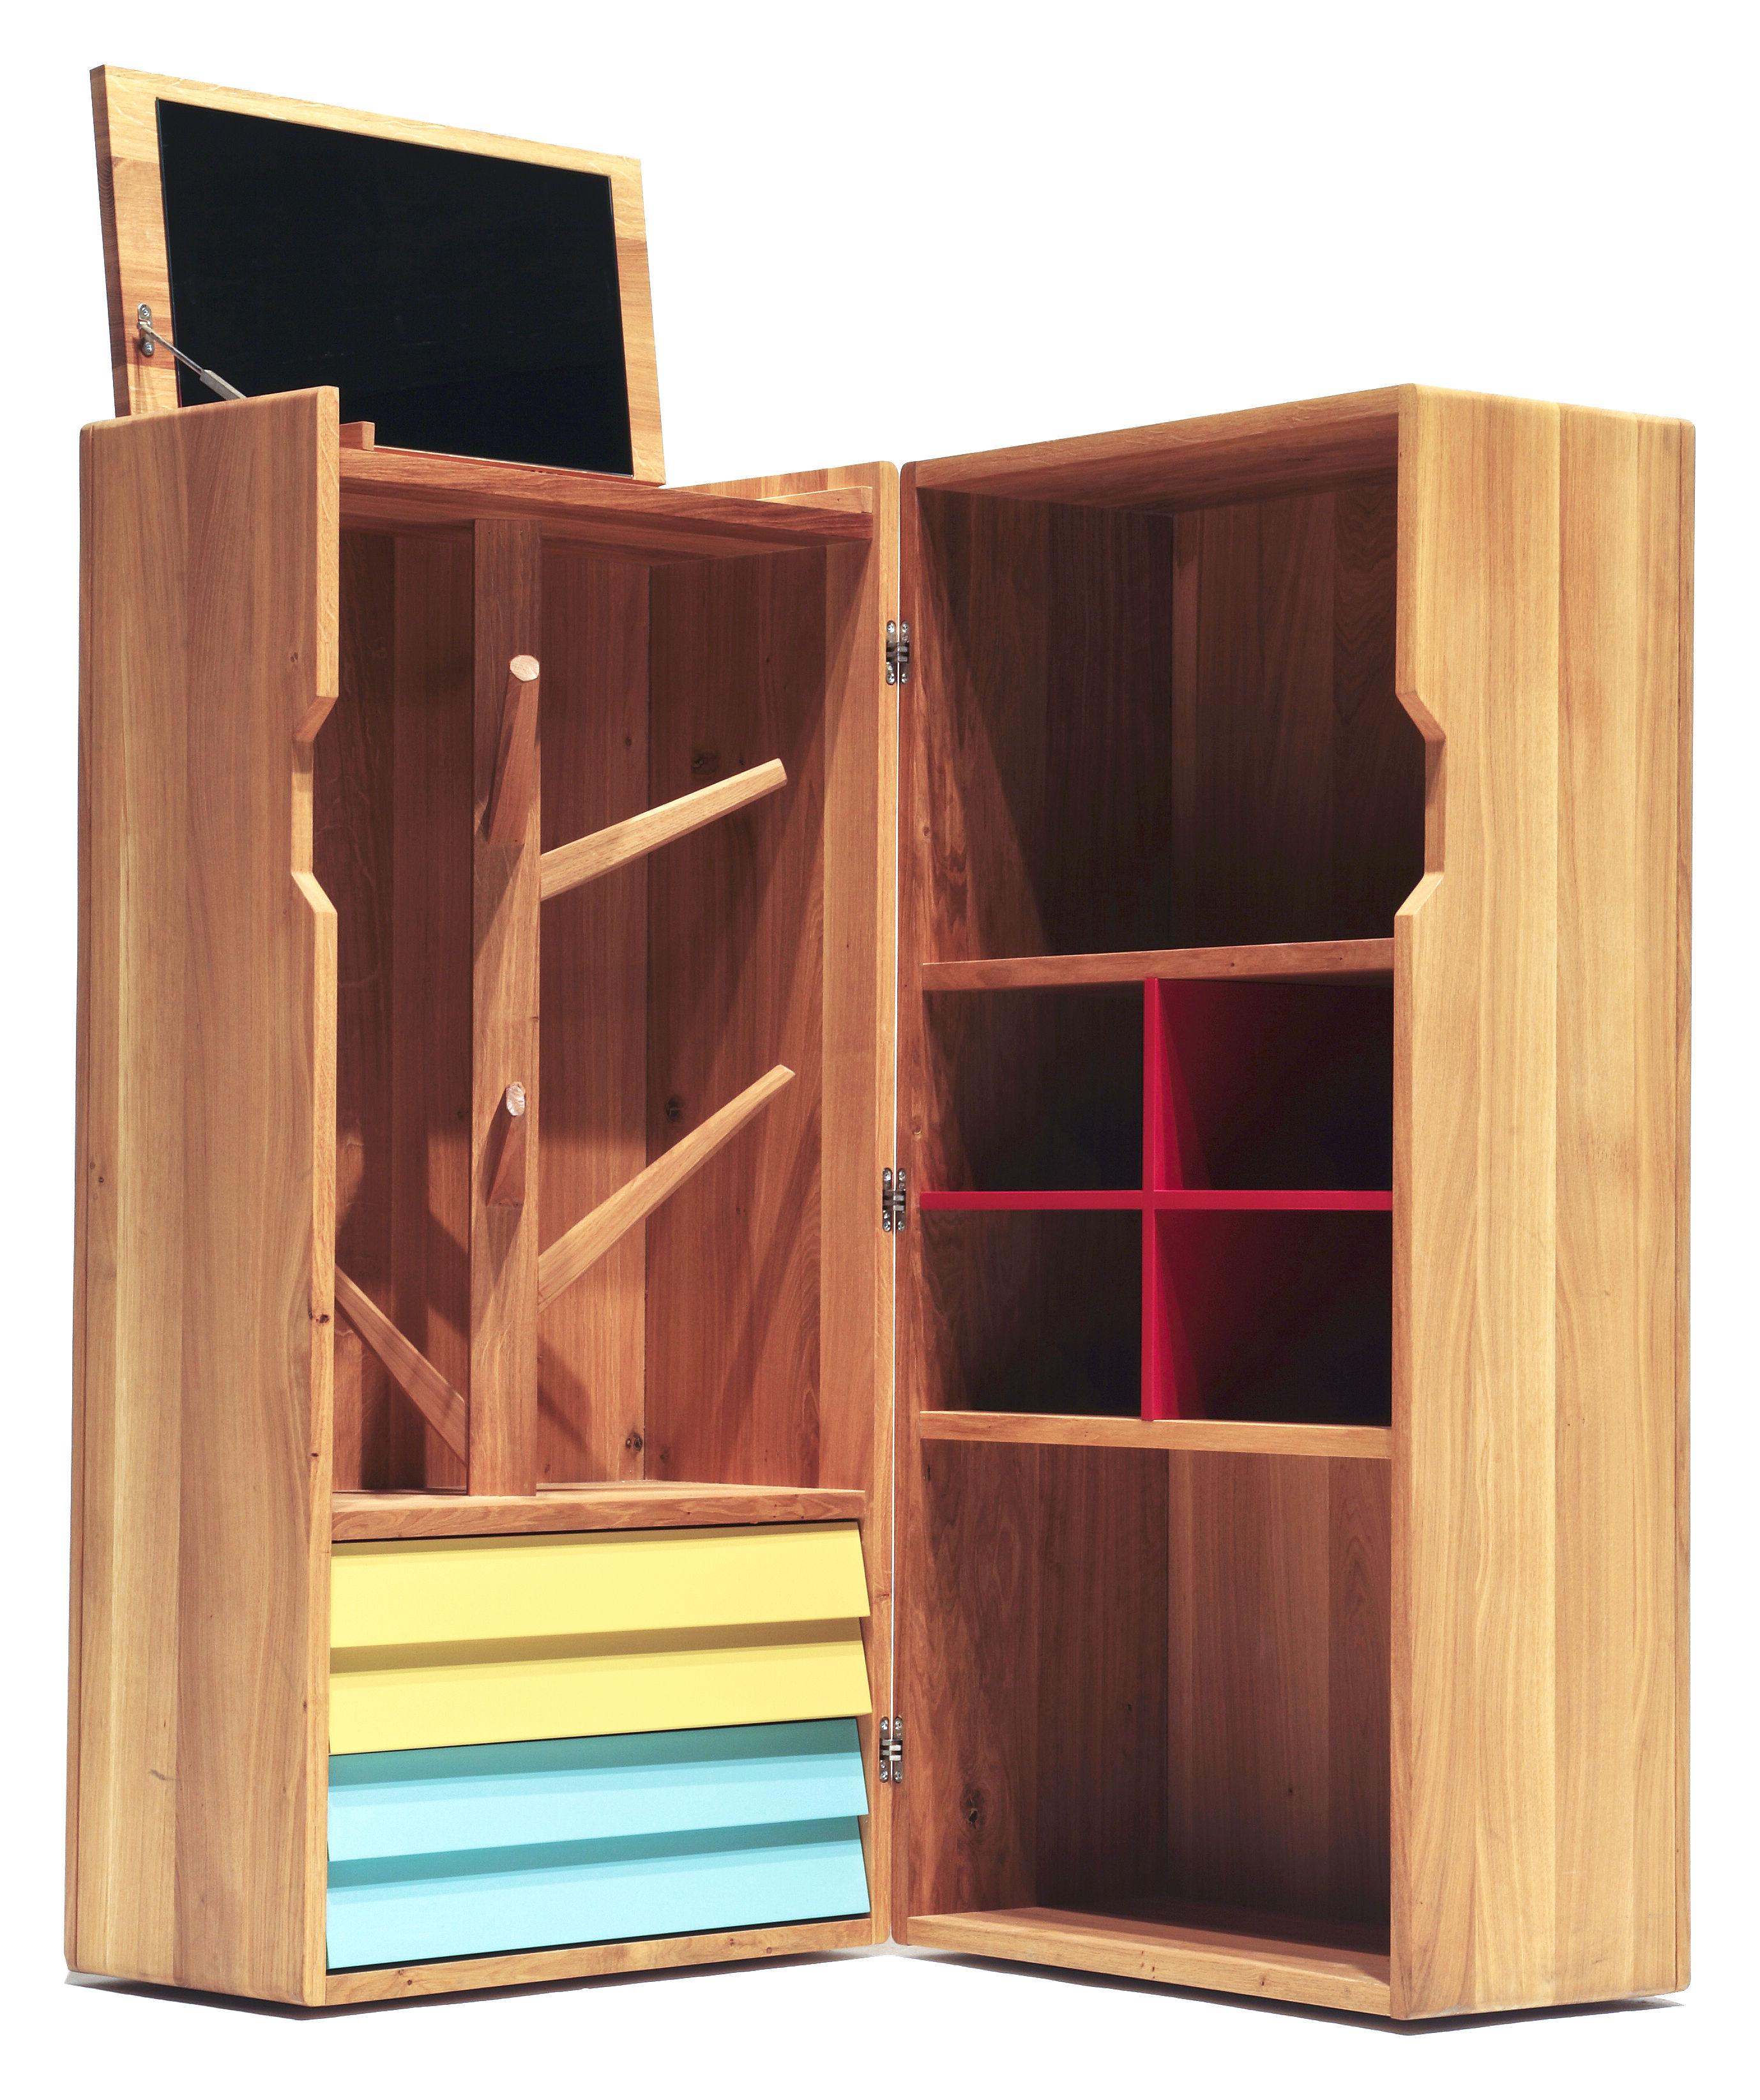 Mobilier - Mobilier d'exception - Malle Remix / Dressing L 140 x H 140 cm - The Hansen Family - Chêne / Jaune, Vert, Rouge - Chêne massif